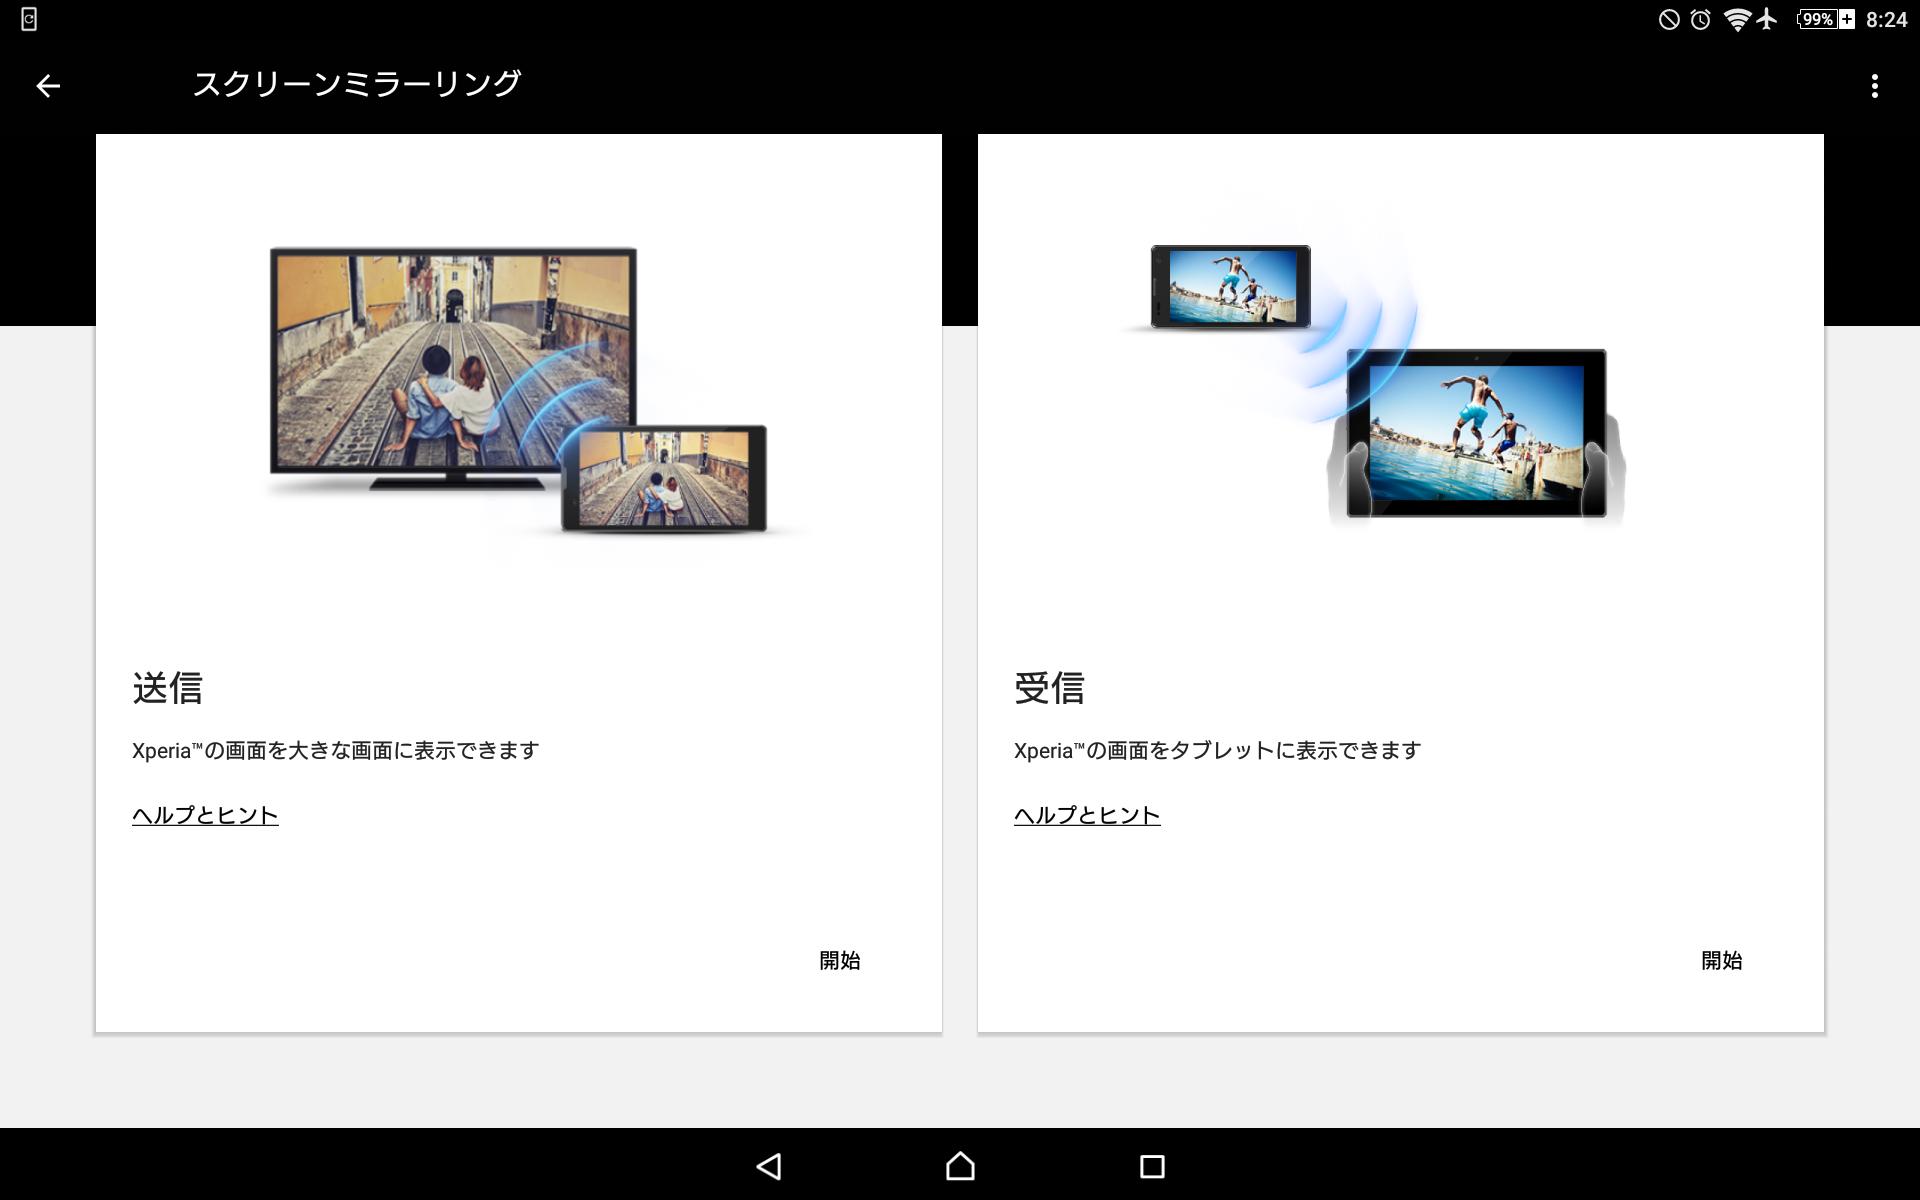 Screenshot_2015-10-14-08-24-09.png